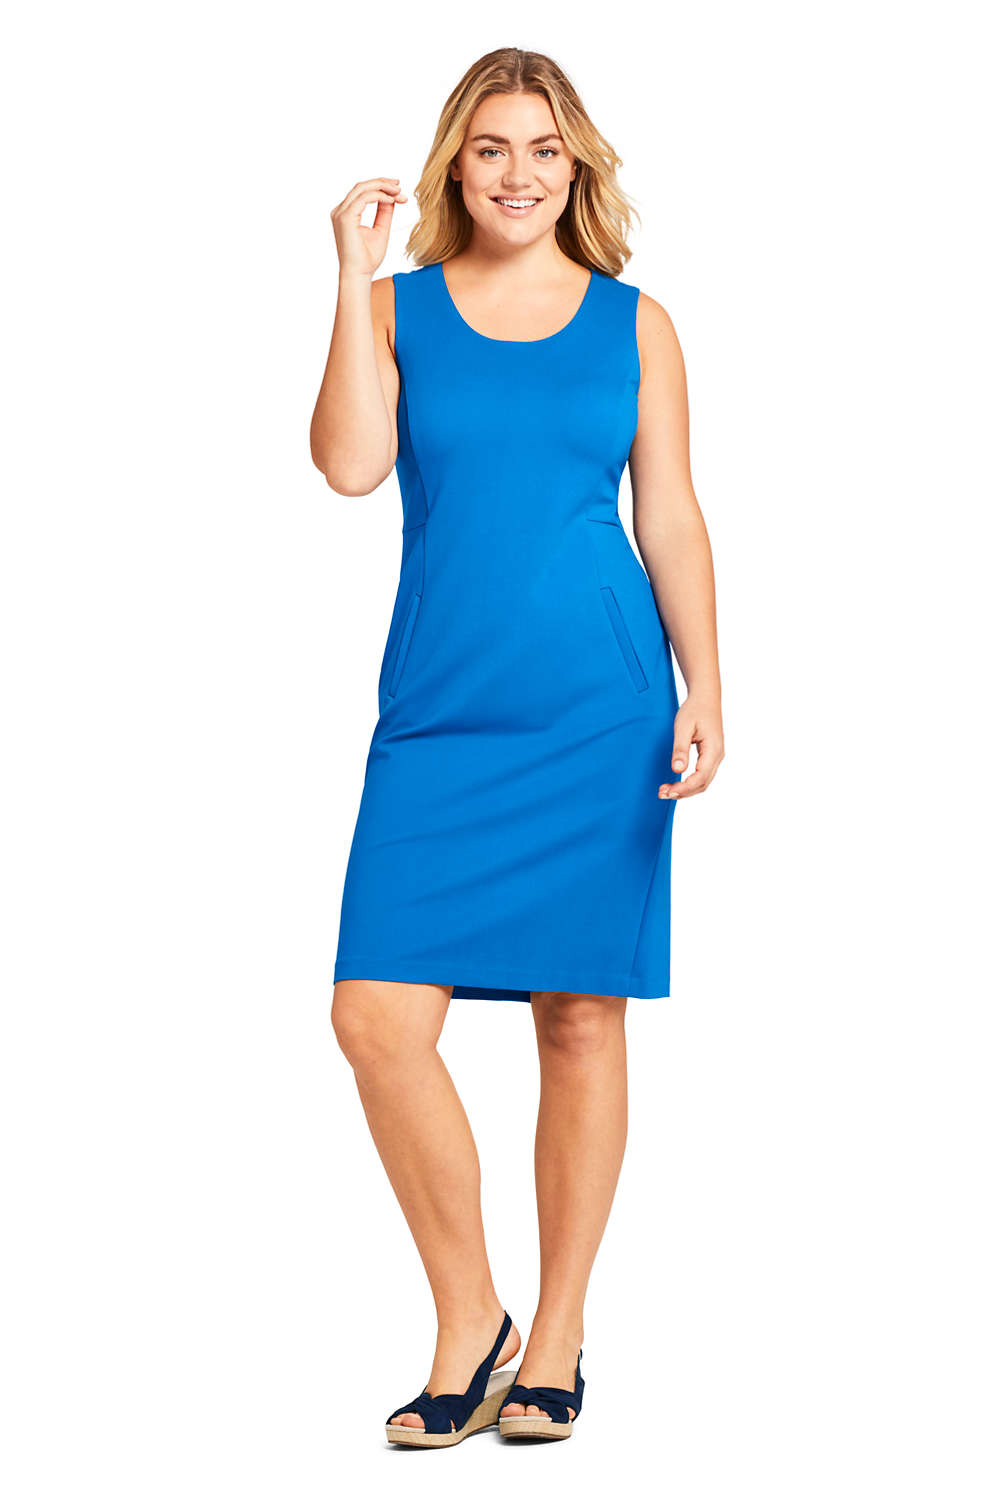 b2aca9d9 Women S Plus Size Sleeveless Scoopneck Ponte Sheath Dress From Lands